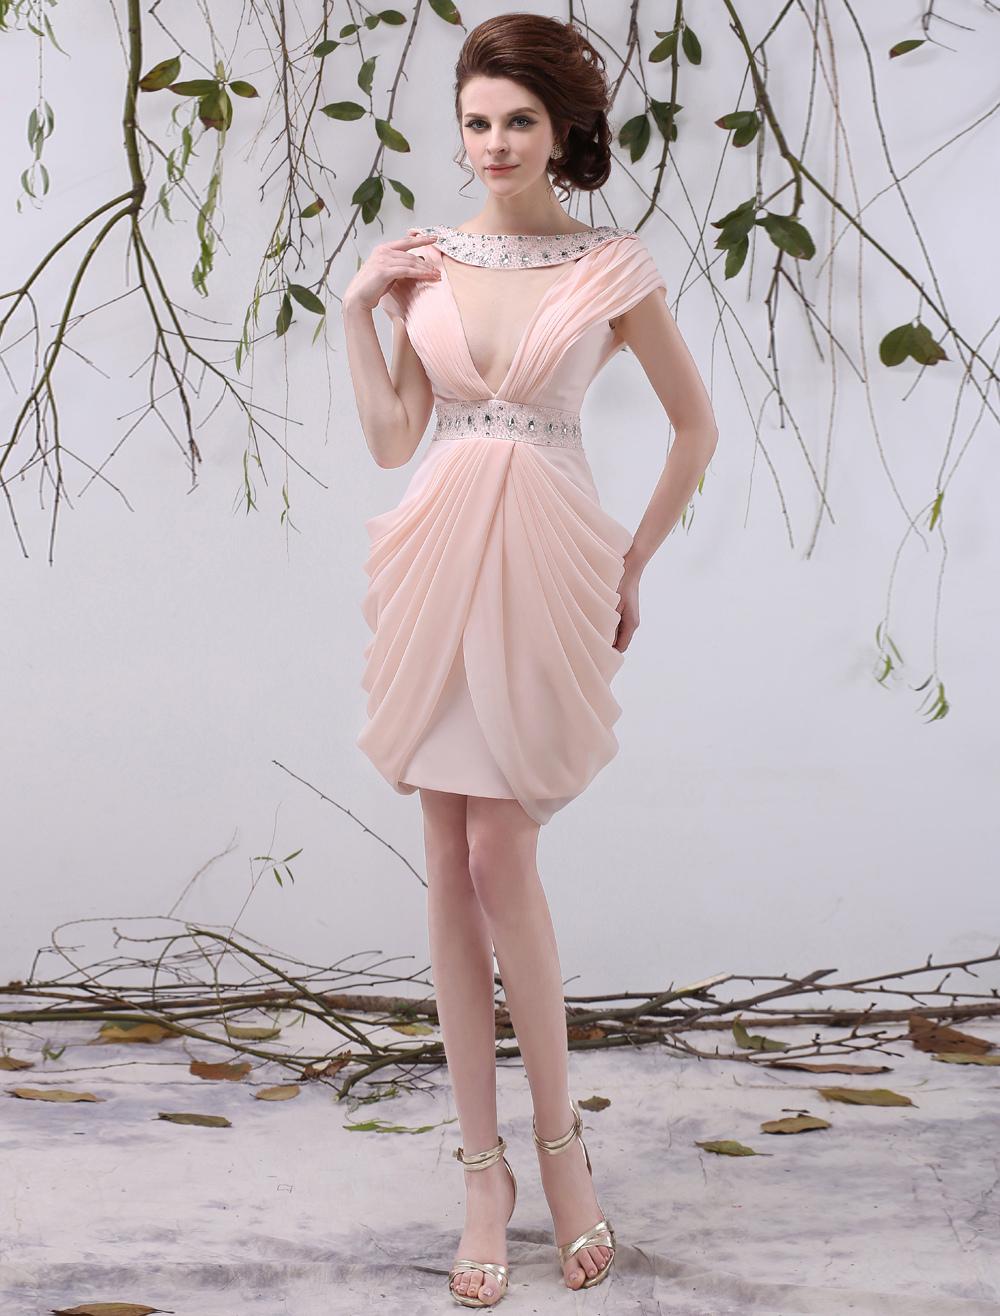 Pink Sheath Bateau Neck Beading Short Sleeves Chiffon Cocktail Dress Milanoo (Wedding Cocktail Dresses) photo